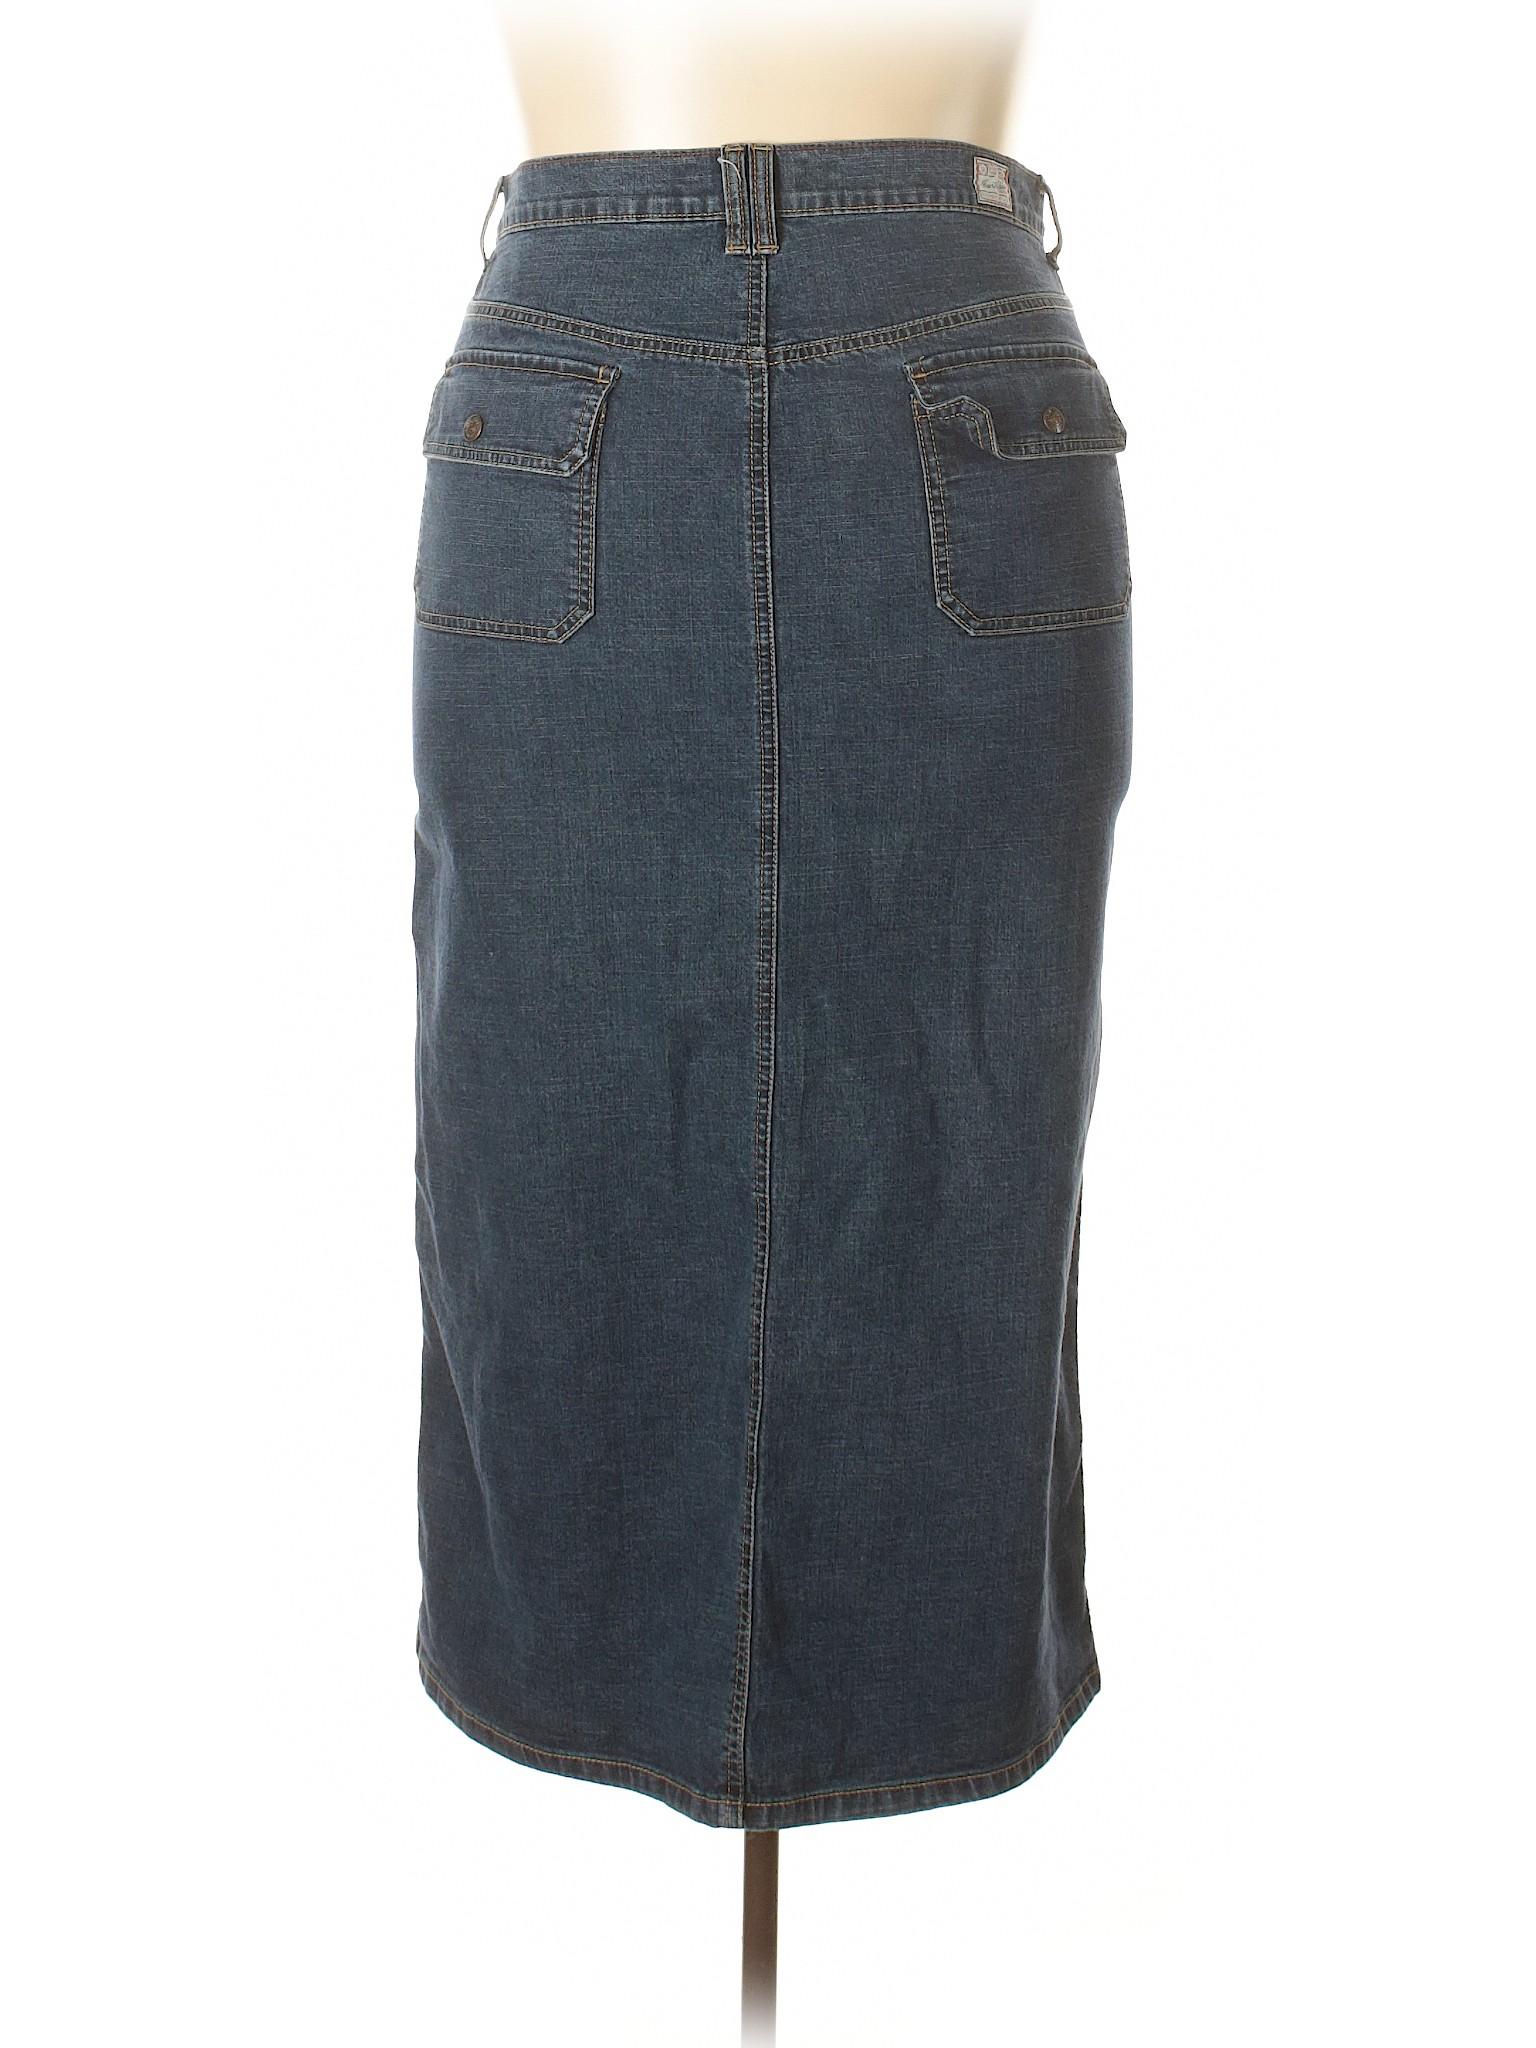 Skirt Boutique Denim Boutique Denim Skirt Boutique Denim wSgxBYxq8